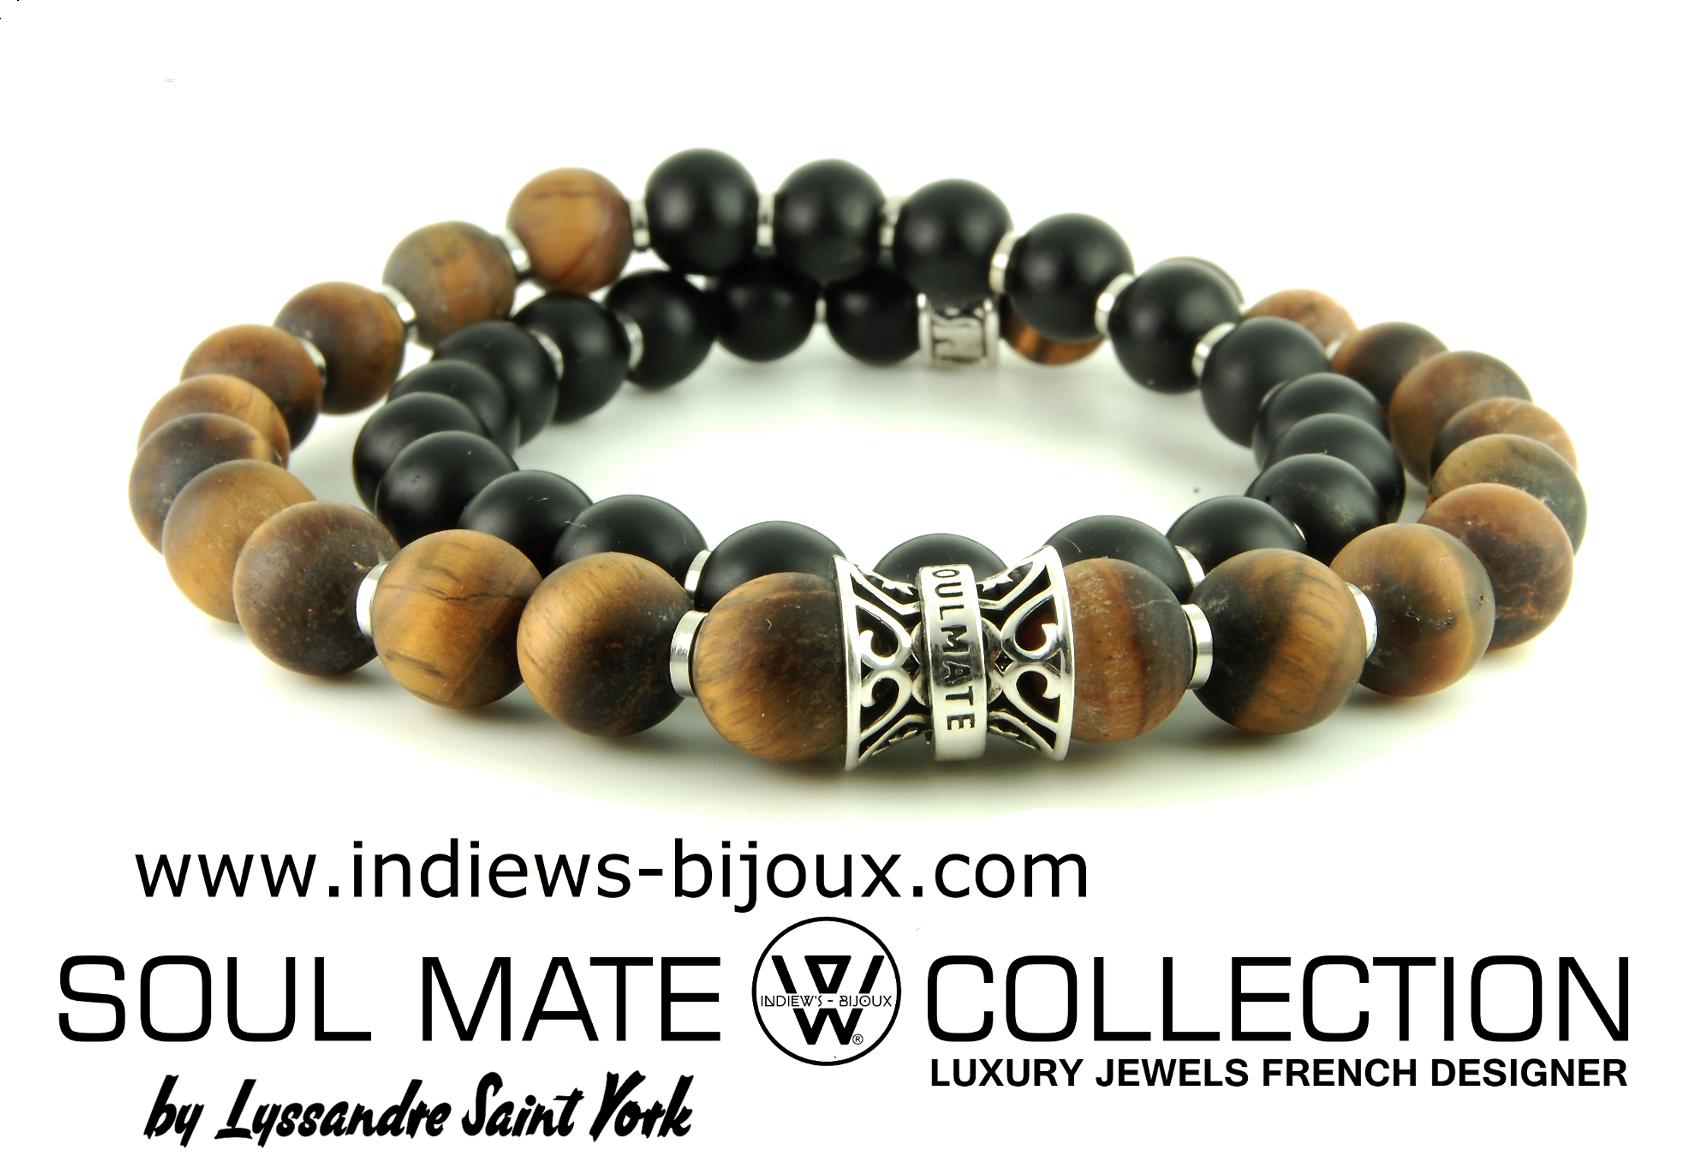 bracelet homme collection designer en argent et perle semi precieuses indiews bijoux. Black Bedroom Furniture Sets. Home Design Ideas